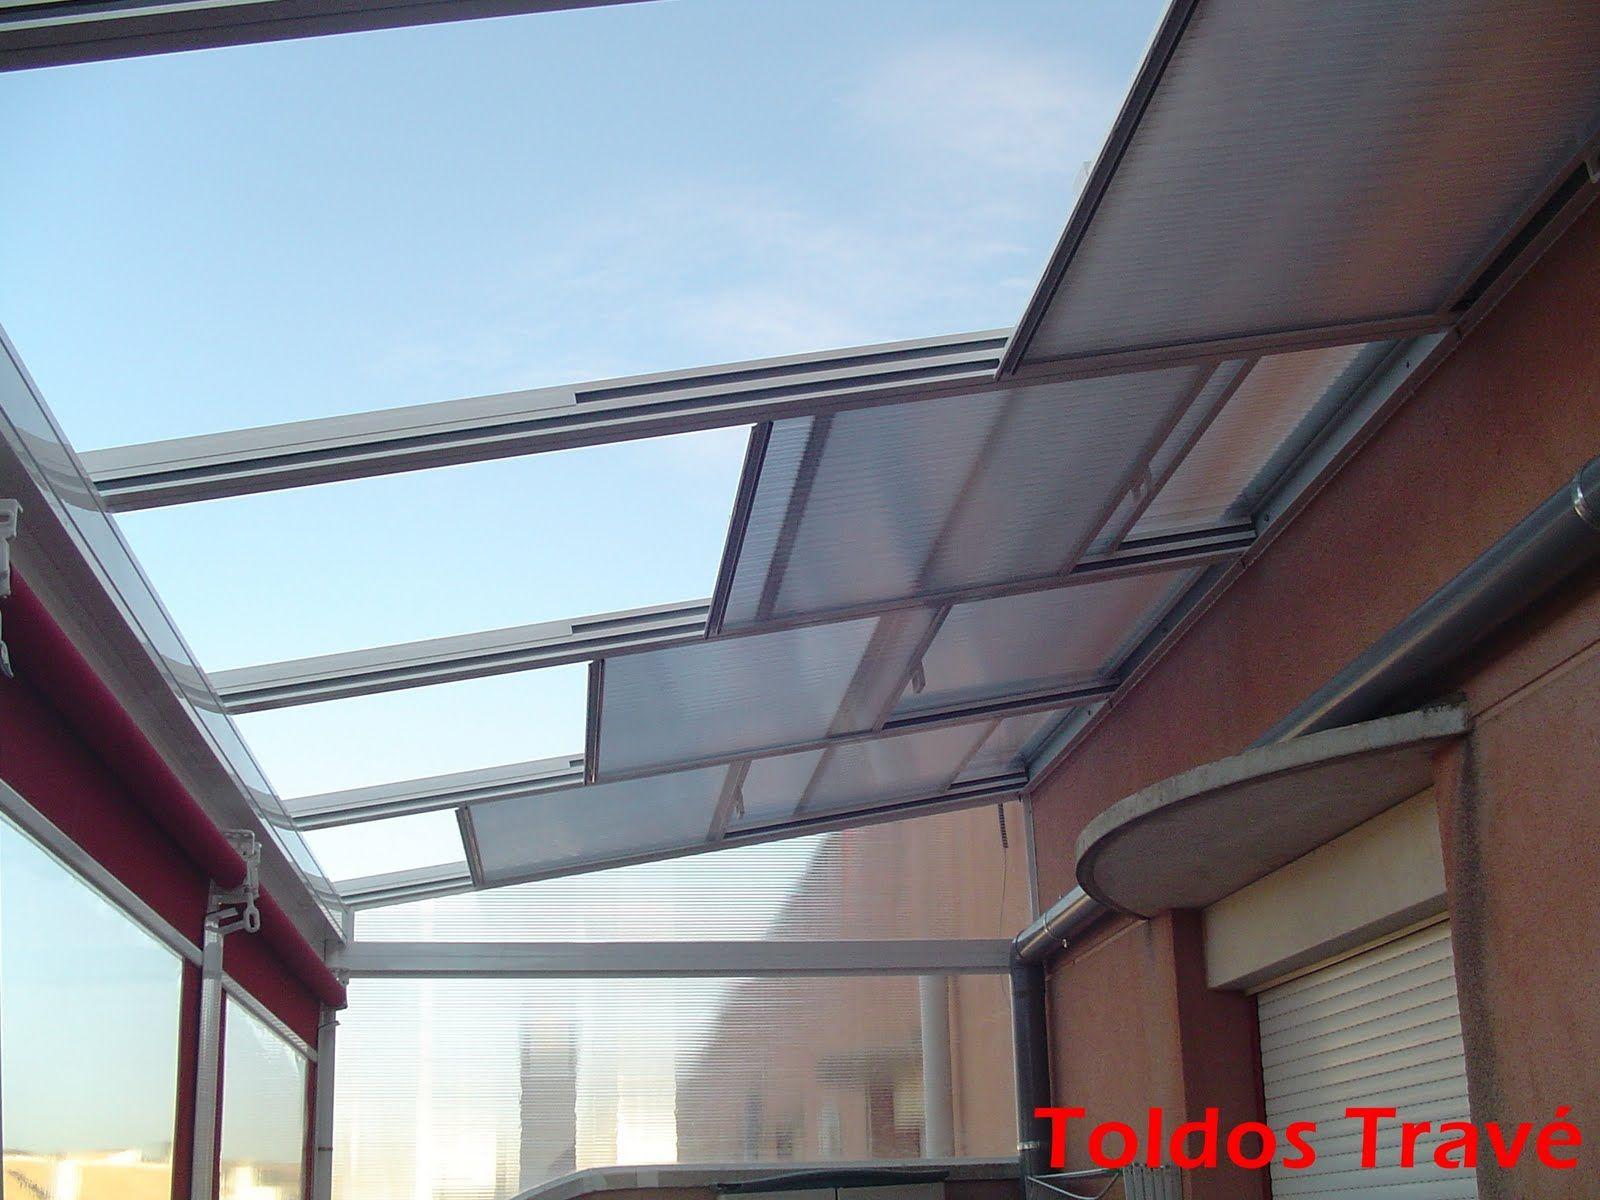 Cerramiento Aluminio Terraza Of Toldos O Cerramientos Terrazas De Aticos Buscar Con